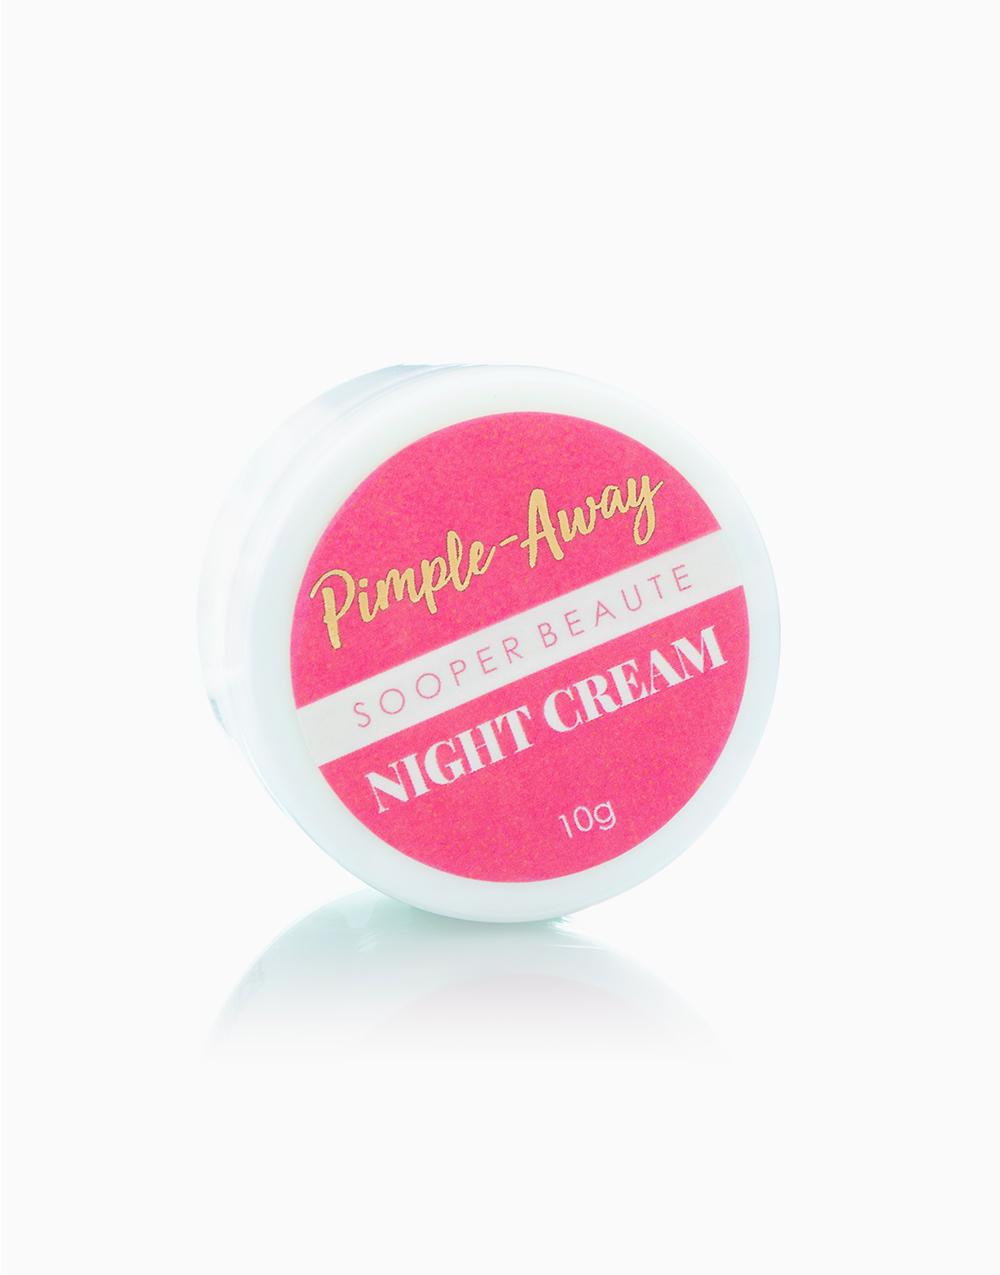 Pimple-Away Night Cream by Sooper Beaute